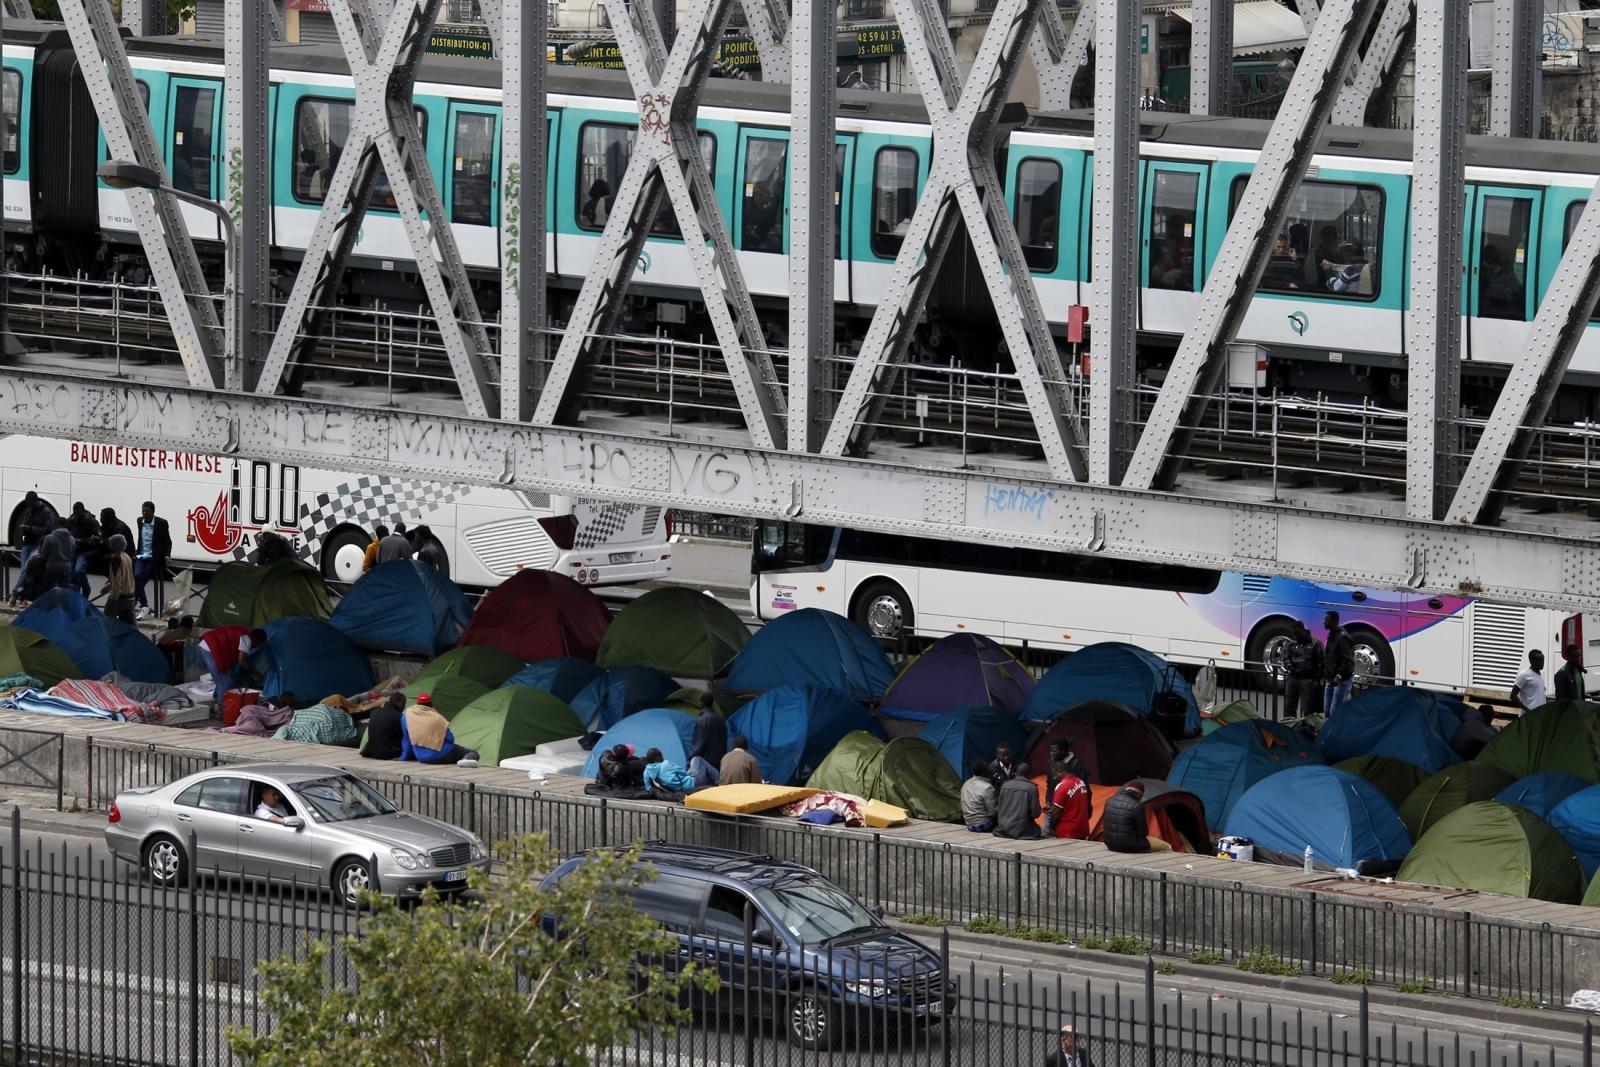 Dover Calais Tunnel >> Calais migrant chaos: Eurotunnel asks £6.7m from France ...